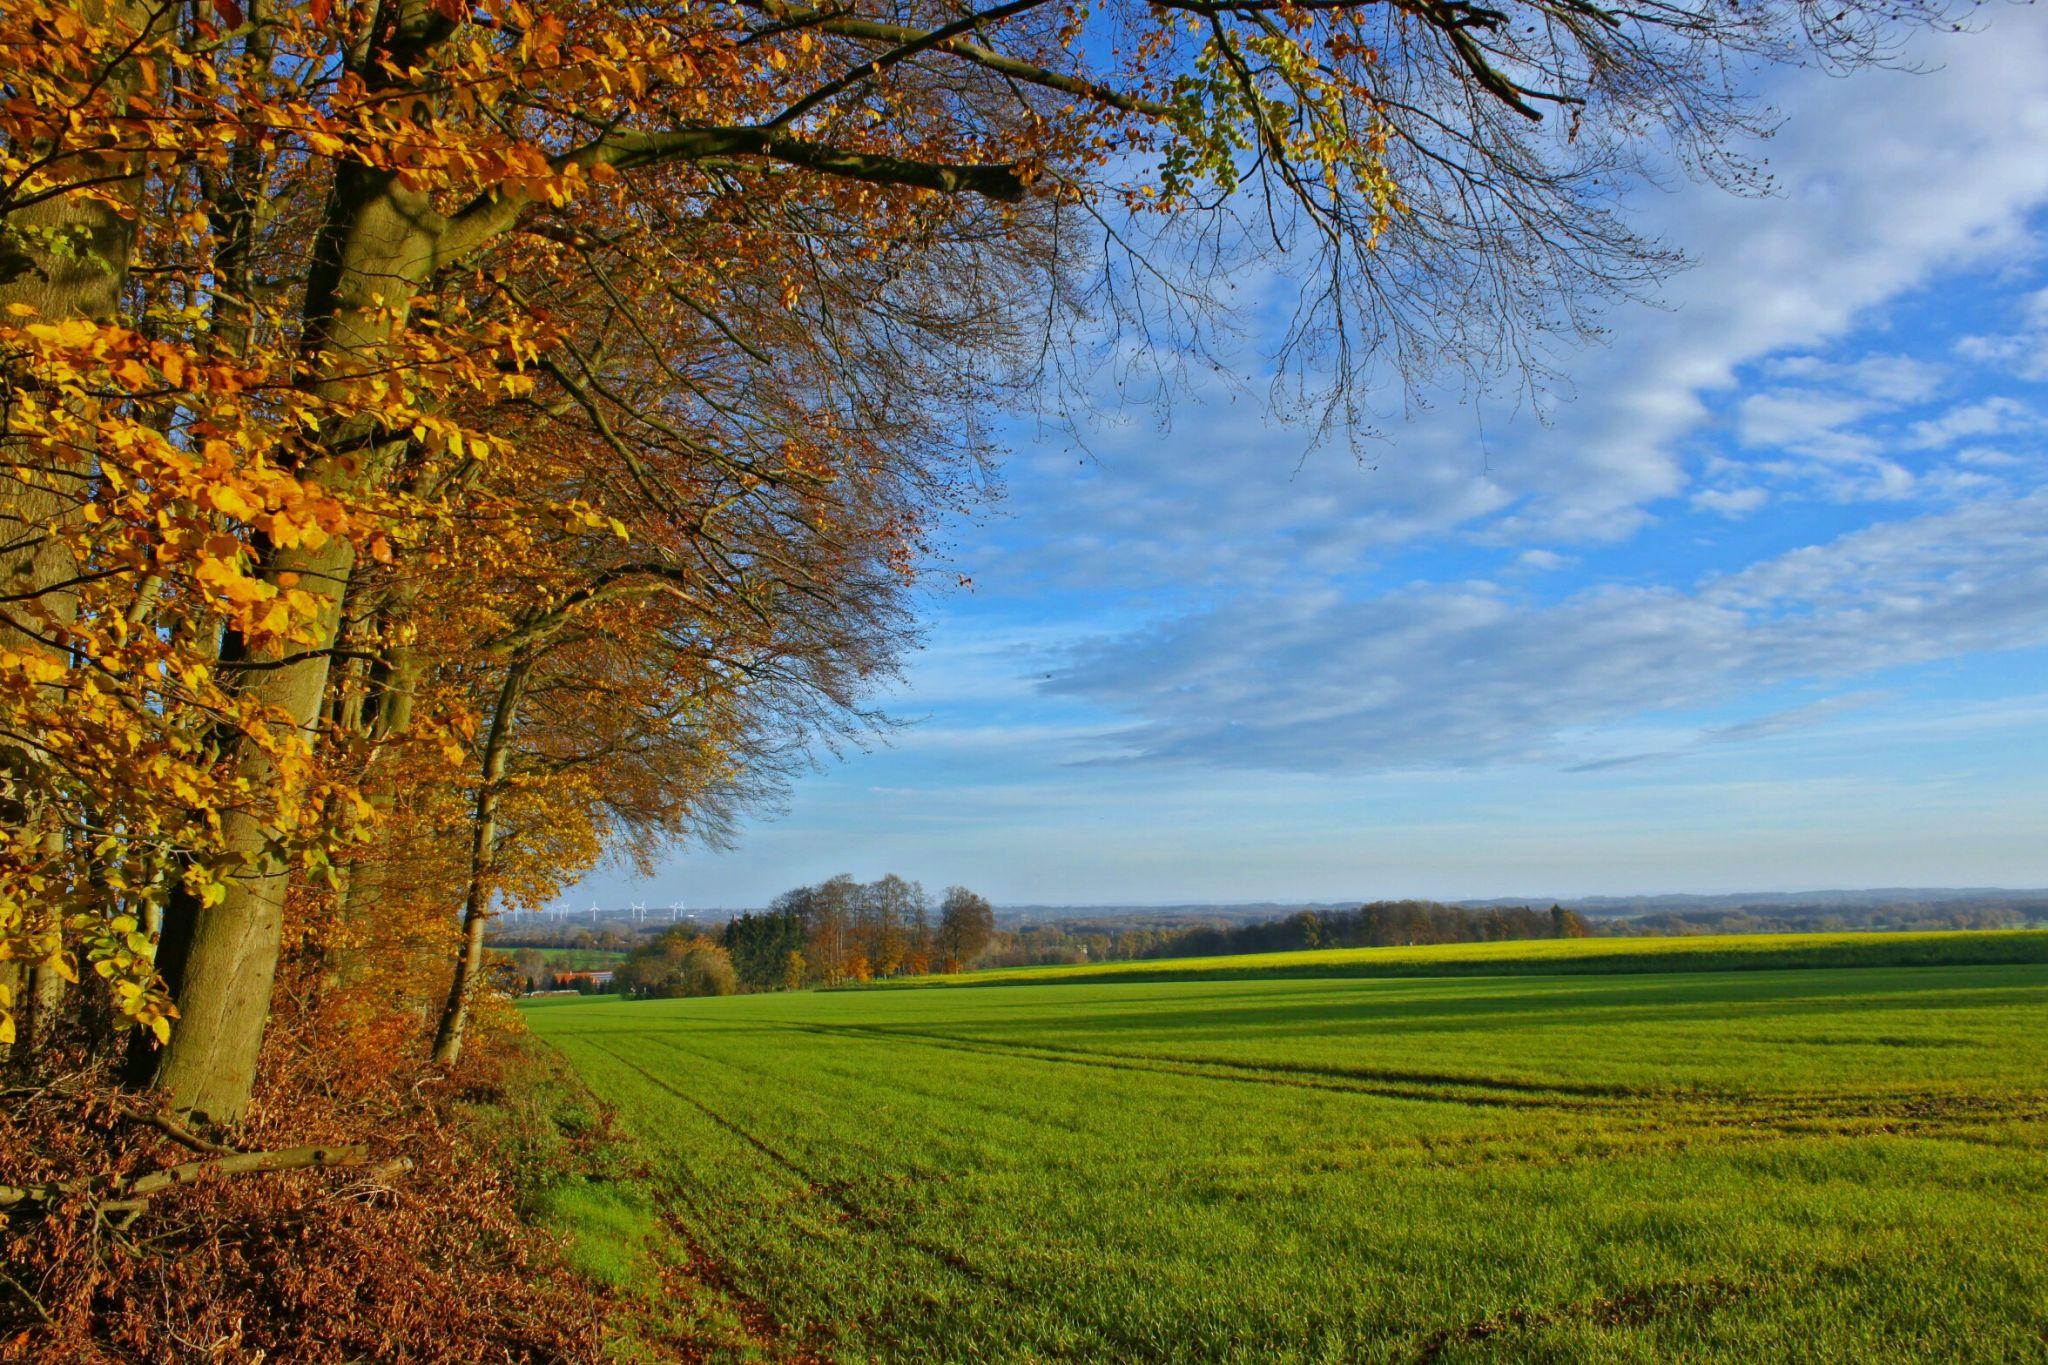 Herbst in den Baumbergen, Germany